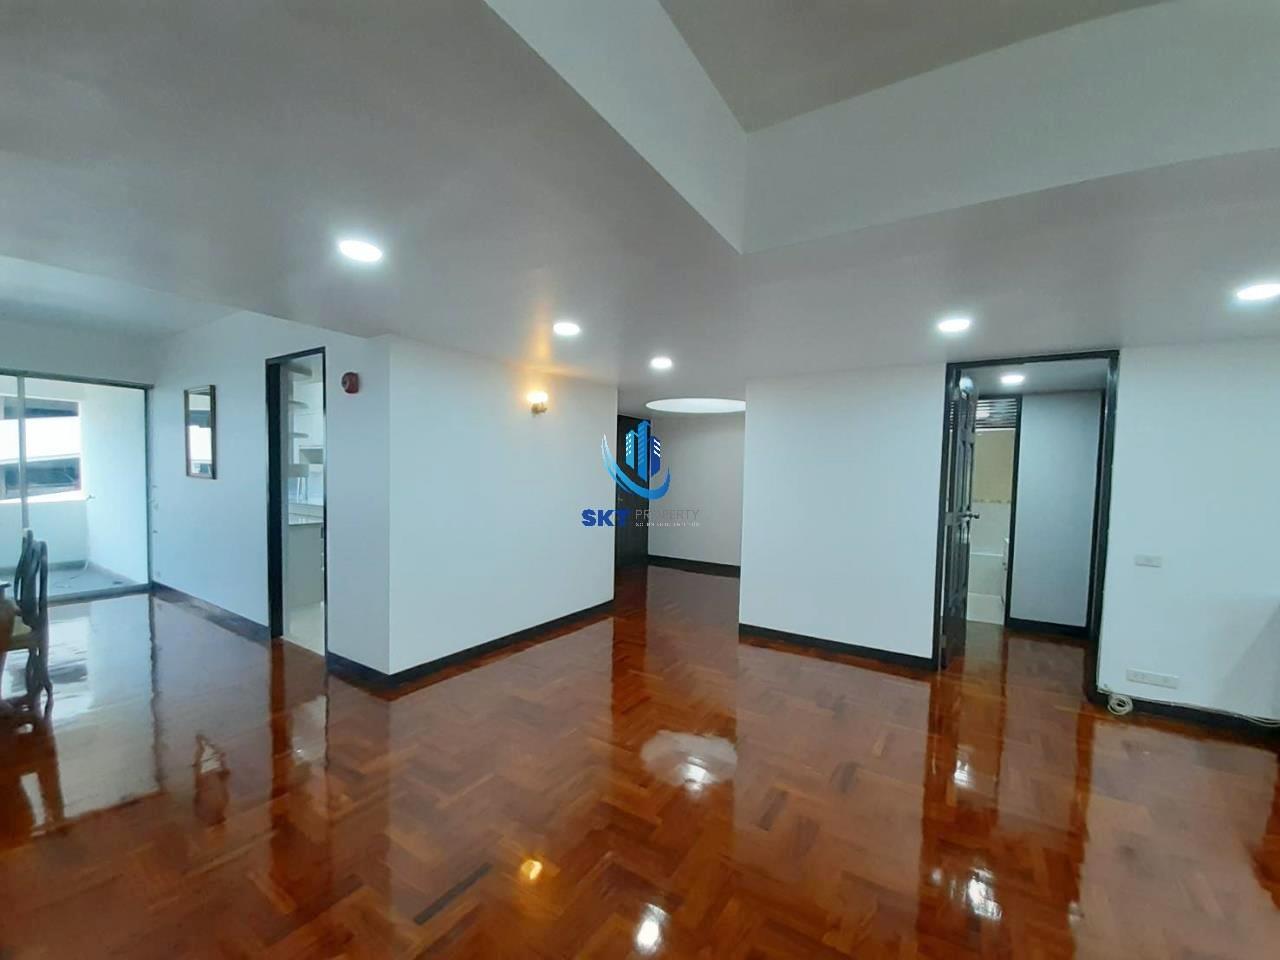 Sukritta Property Agency's Kanta mansion sukhumvit 26 - Bts Prompong 3